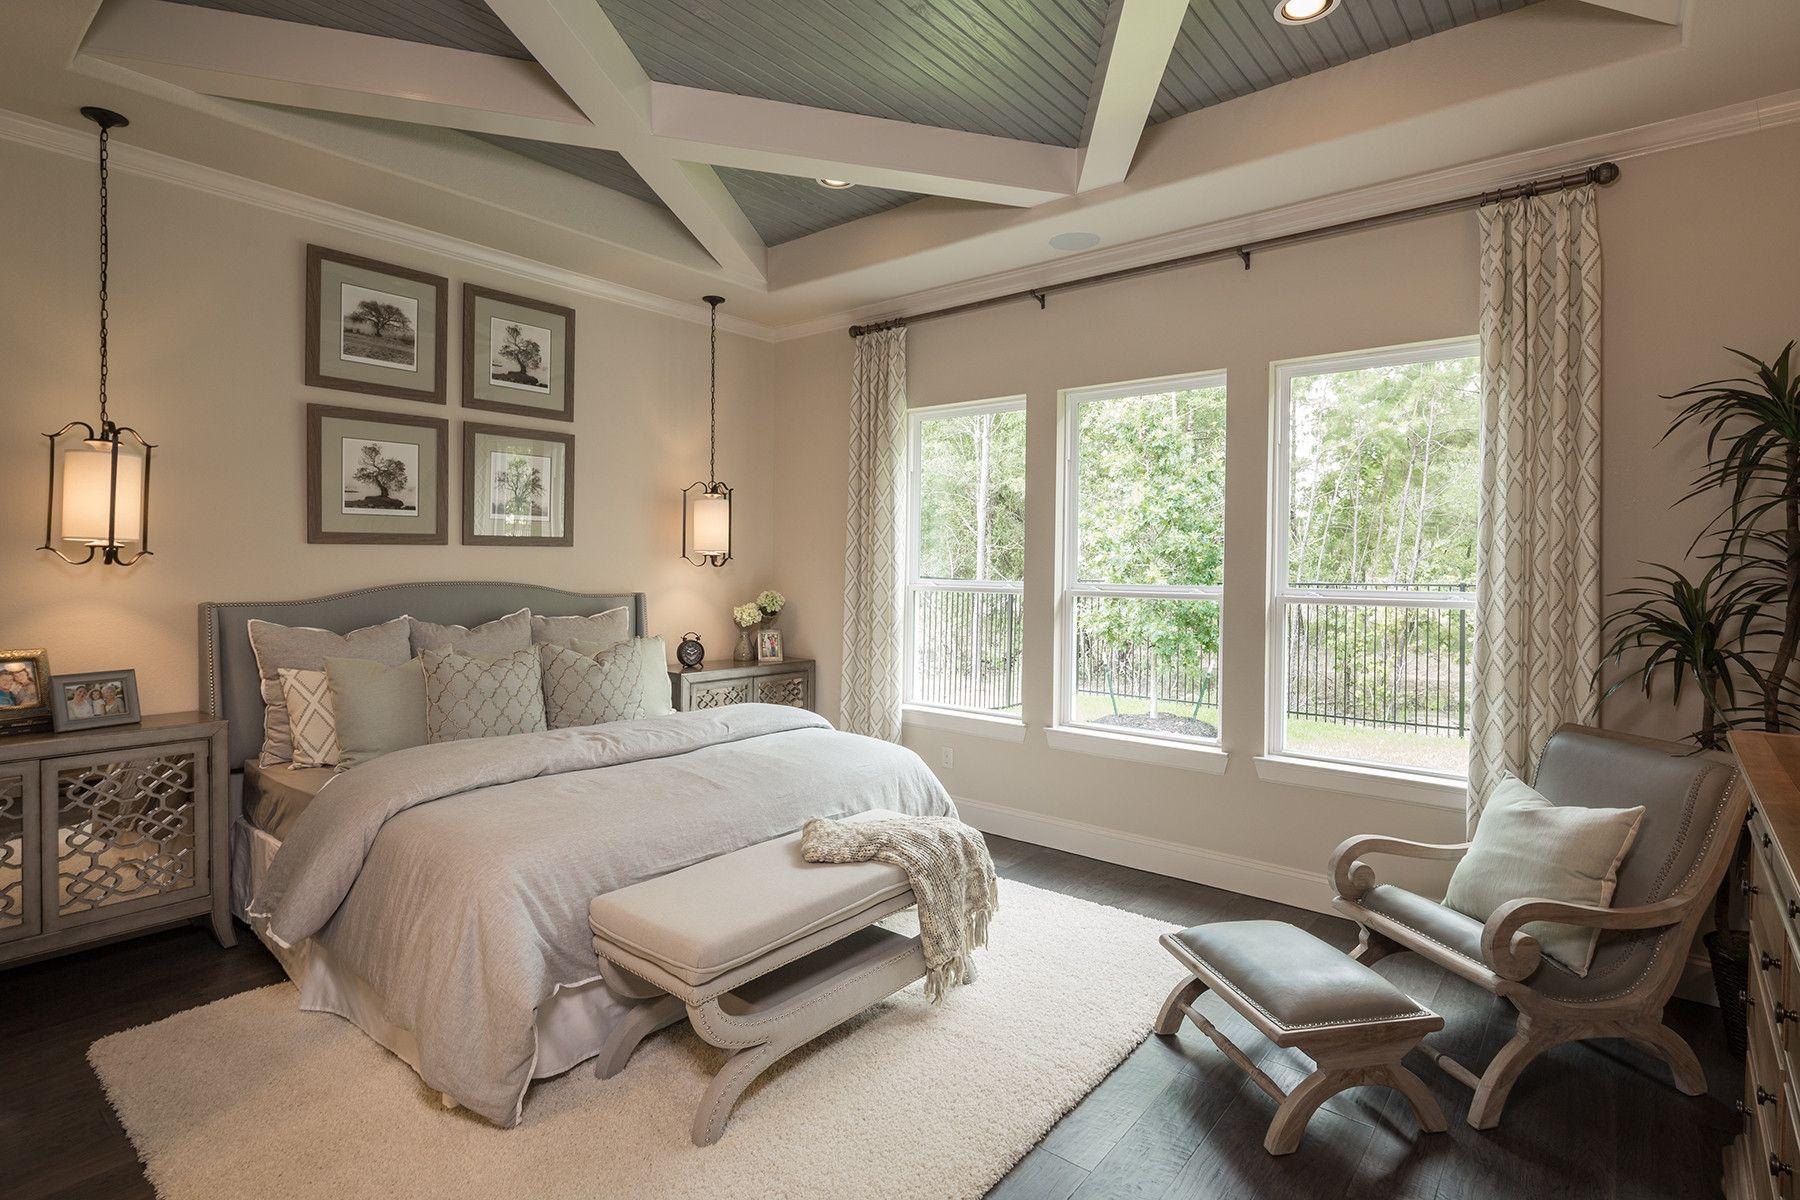 Bedroom-in-Plan 5137-at-Sienna Plantation 60' Series at Village of Sawmill Lake-in-Missouri City